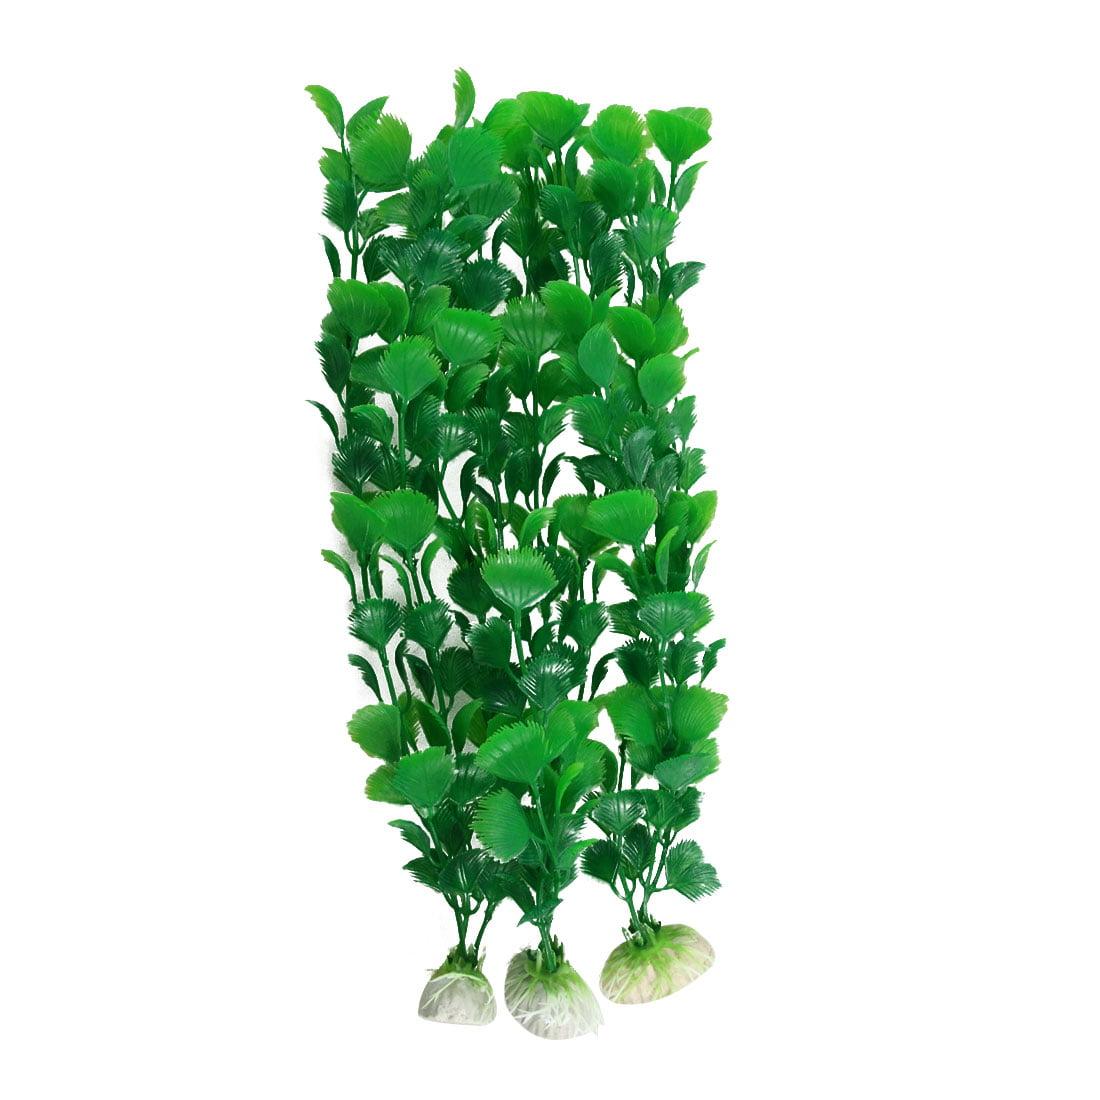 3 Pcs Green Fan Shaped Leaf Fish Tank Artificial Plant